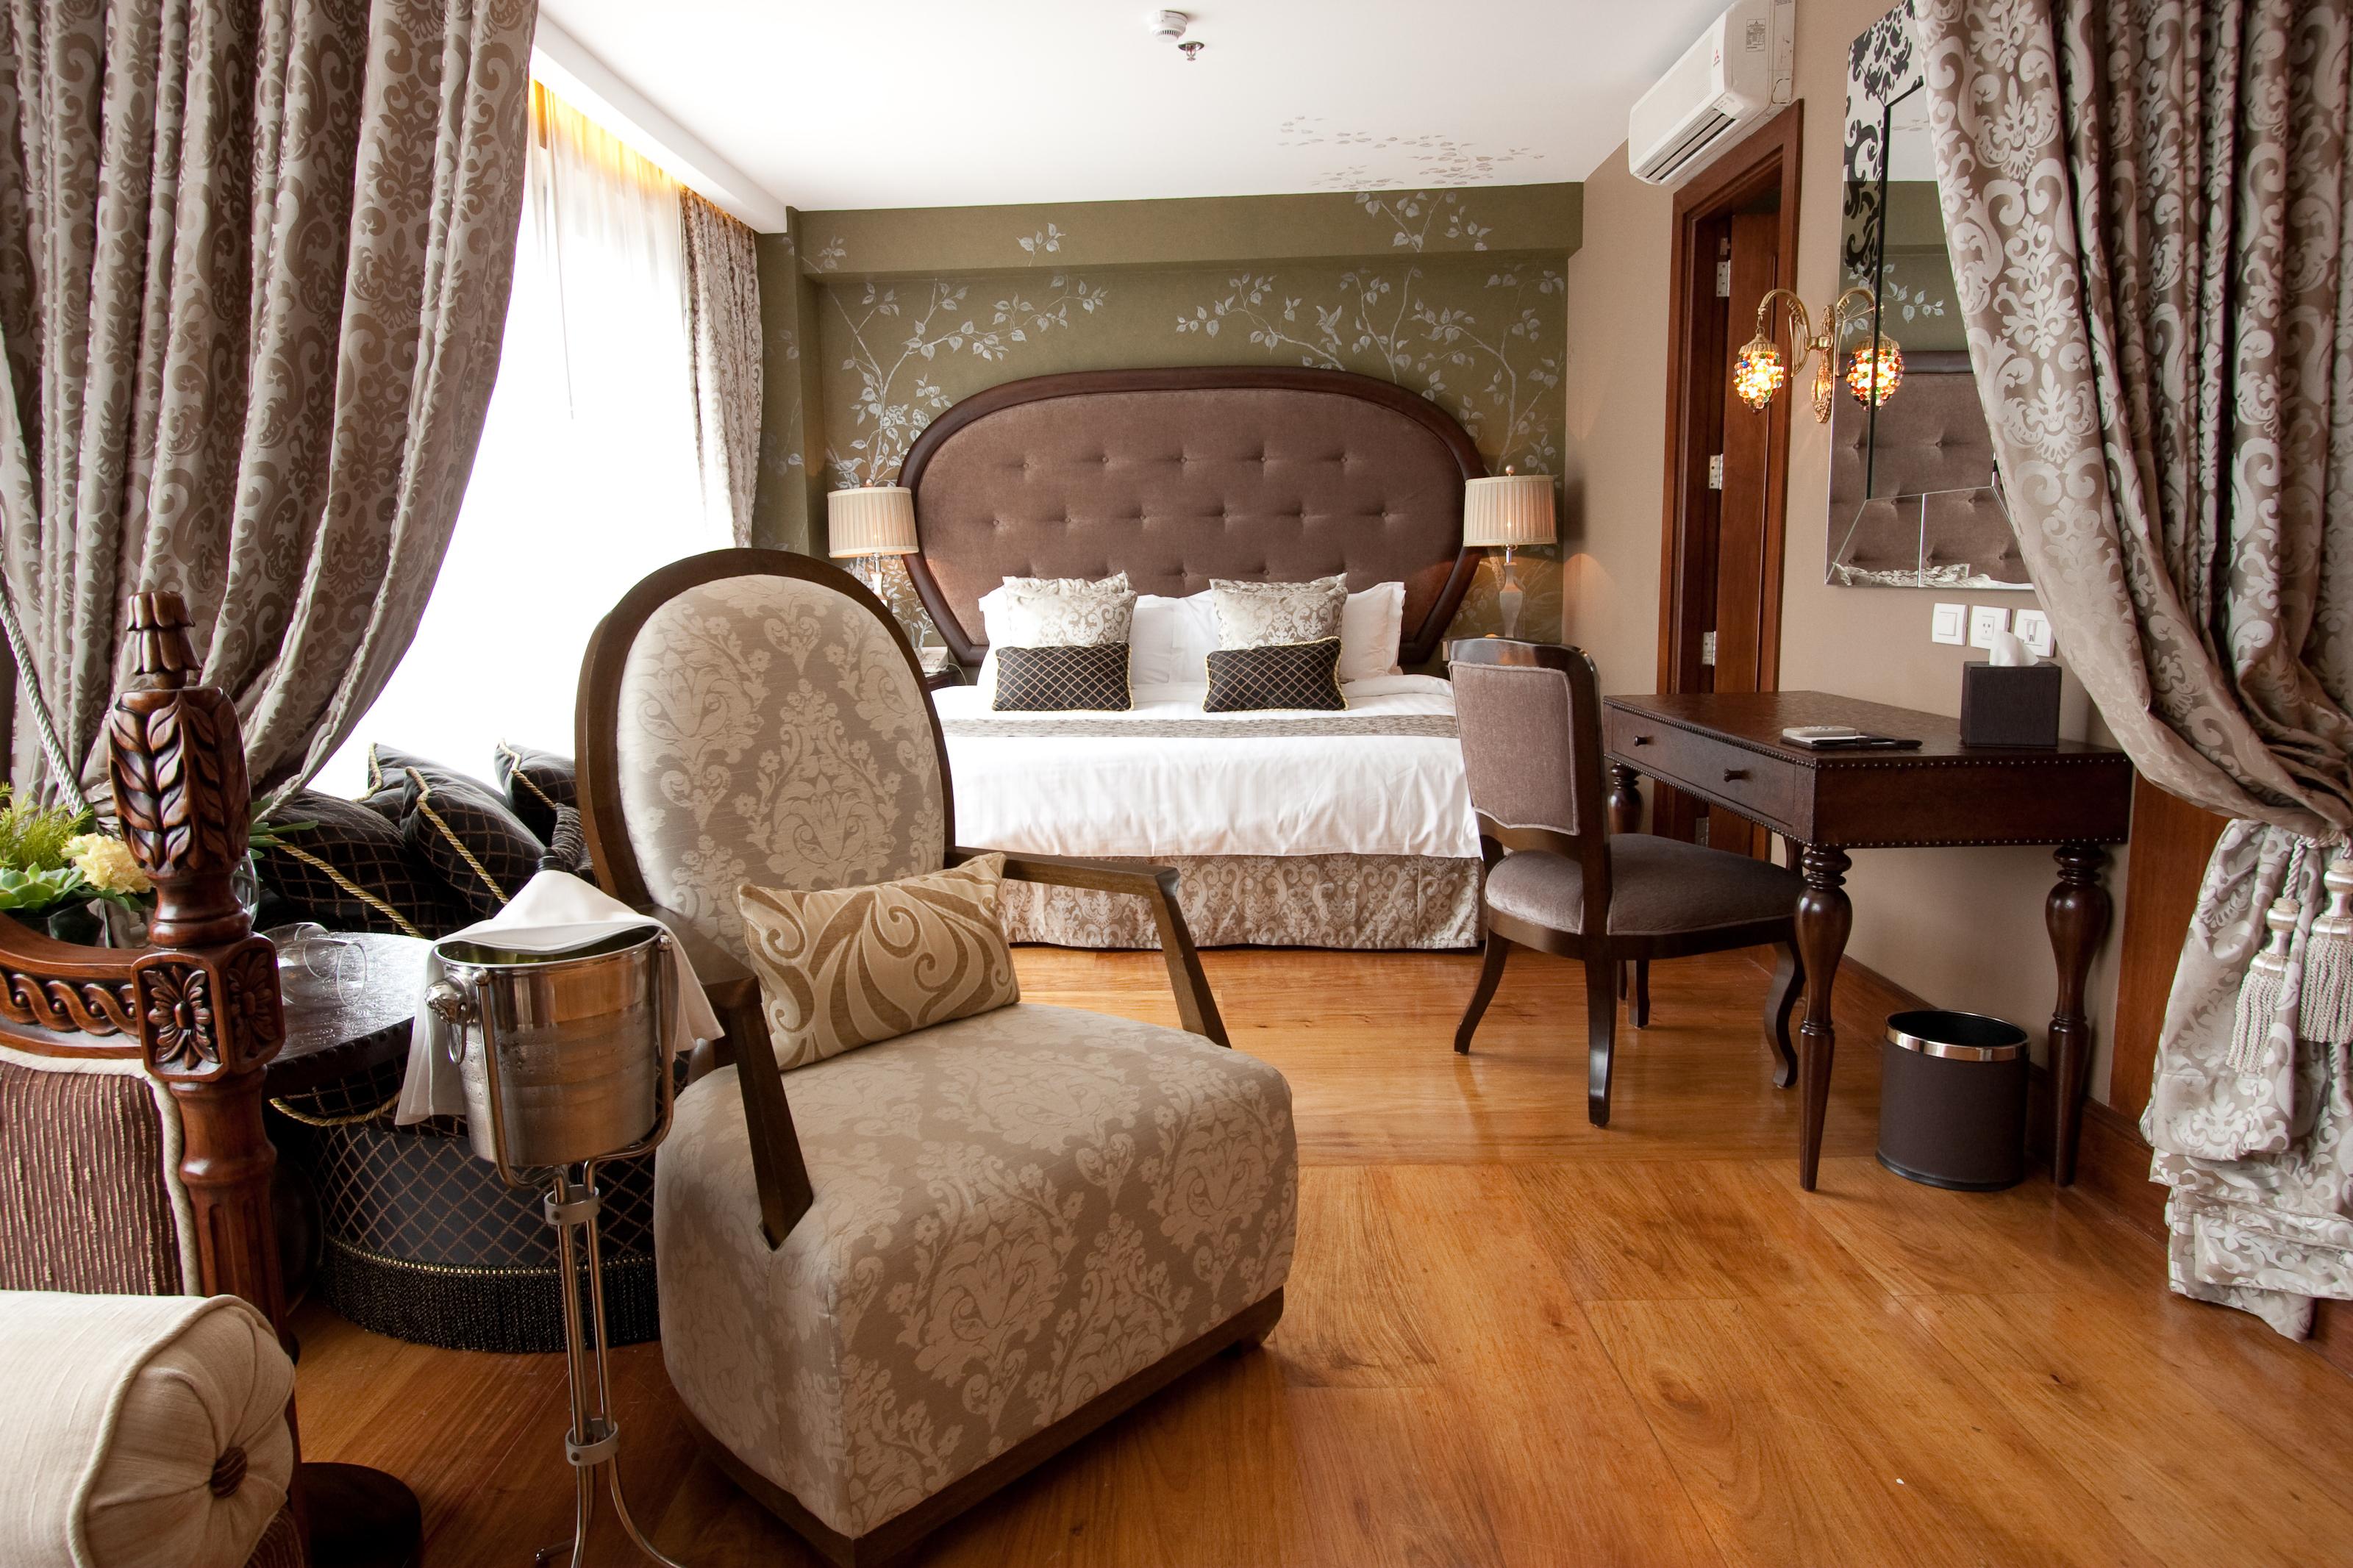 City-Guide-Makati-Hotel-Celeste